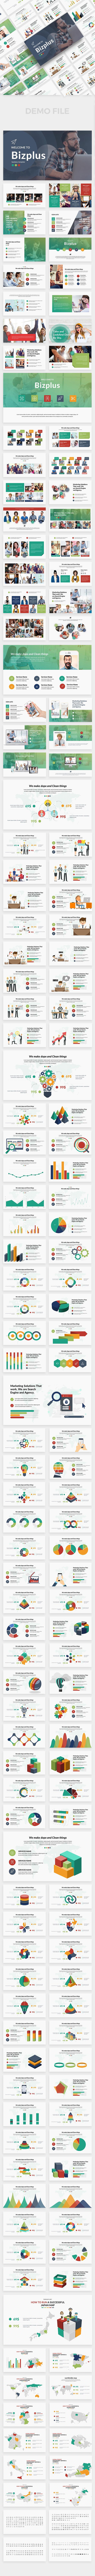 BizPlus Multipurpose Google Slide Template - Google Slides Presentation Templates